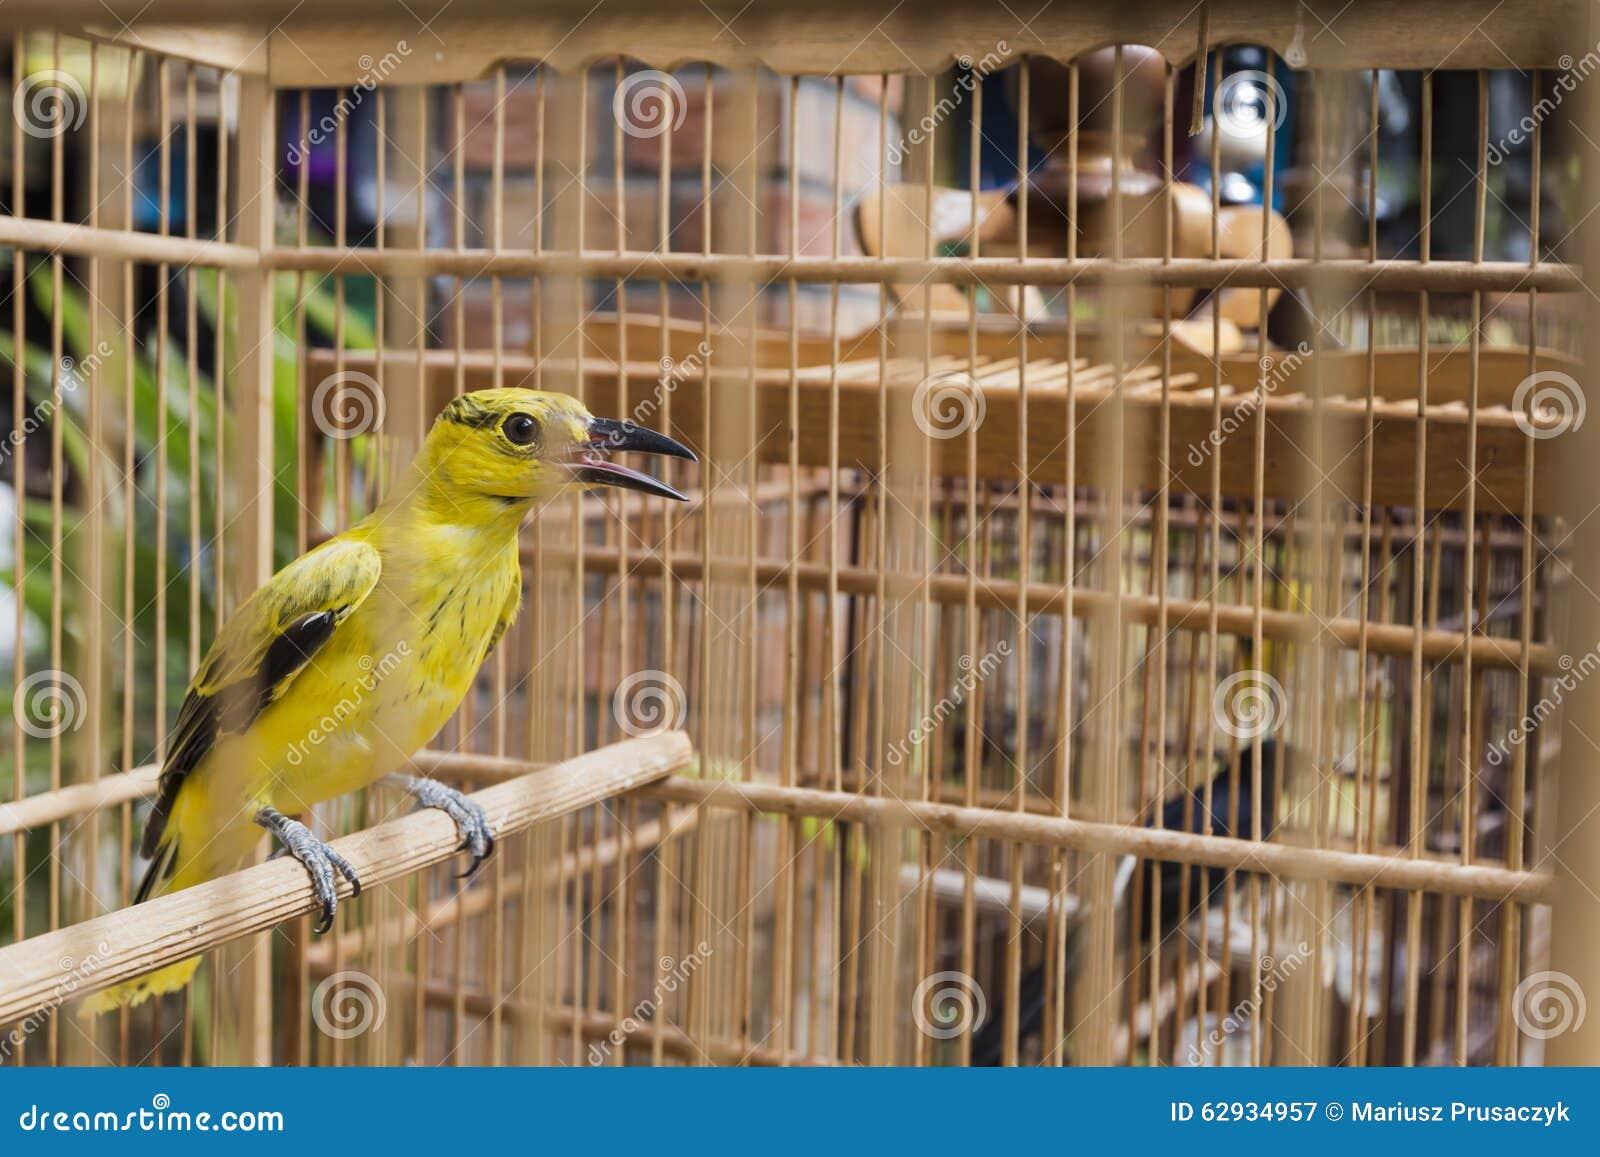 oiseaux color s vendre au march d 39 oiseau yogyakarta java indon sie photo stock image. Black Bedroom Furniture Sets. Home Design Ideas